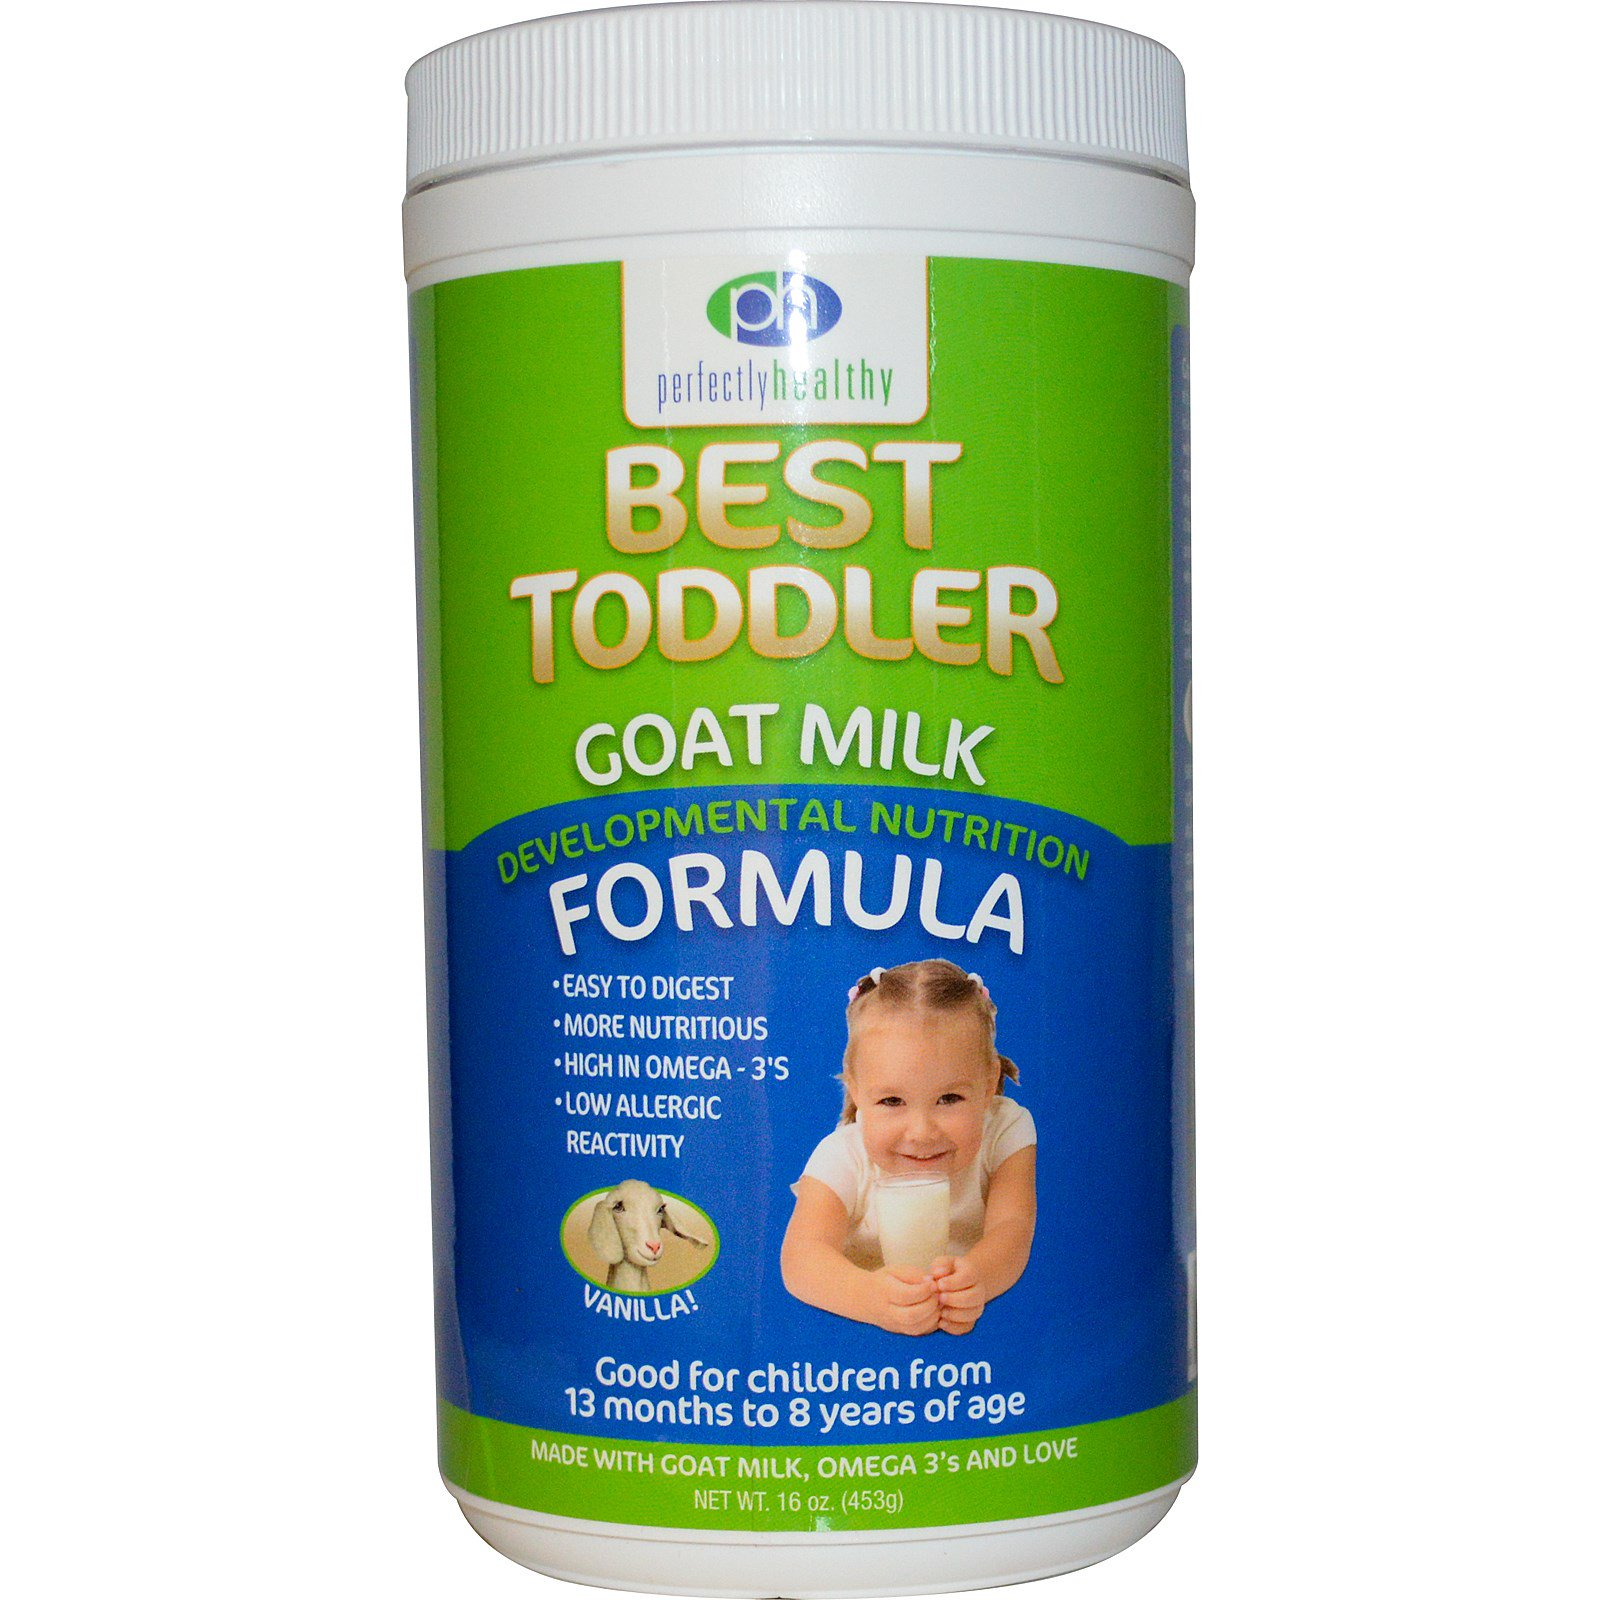 daacce96 Mt. Capra, Perfectly Healthy, Best Toddler Goat Milk Formula, Vanilla, 16  oz (453 g) (Discontinued Item)